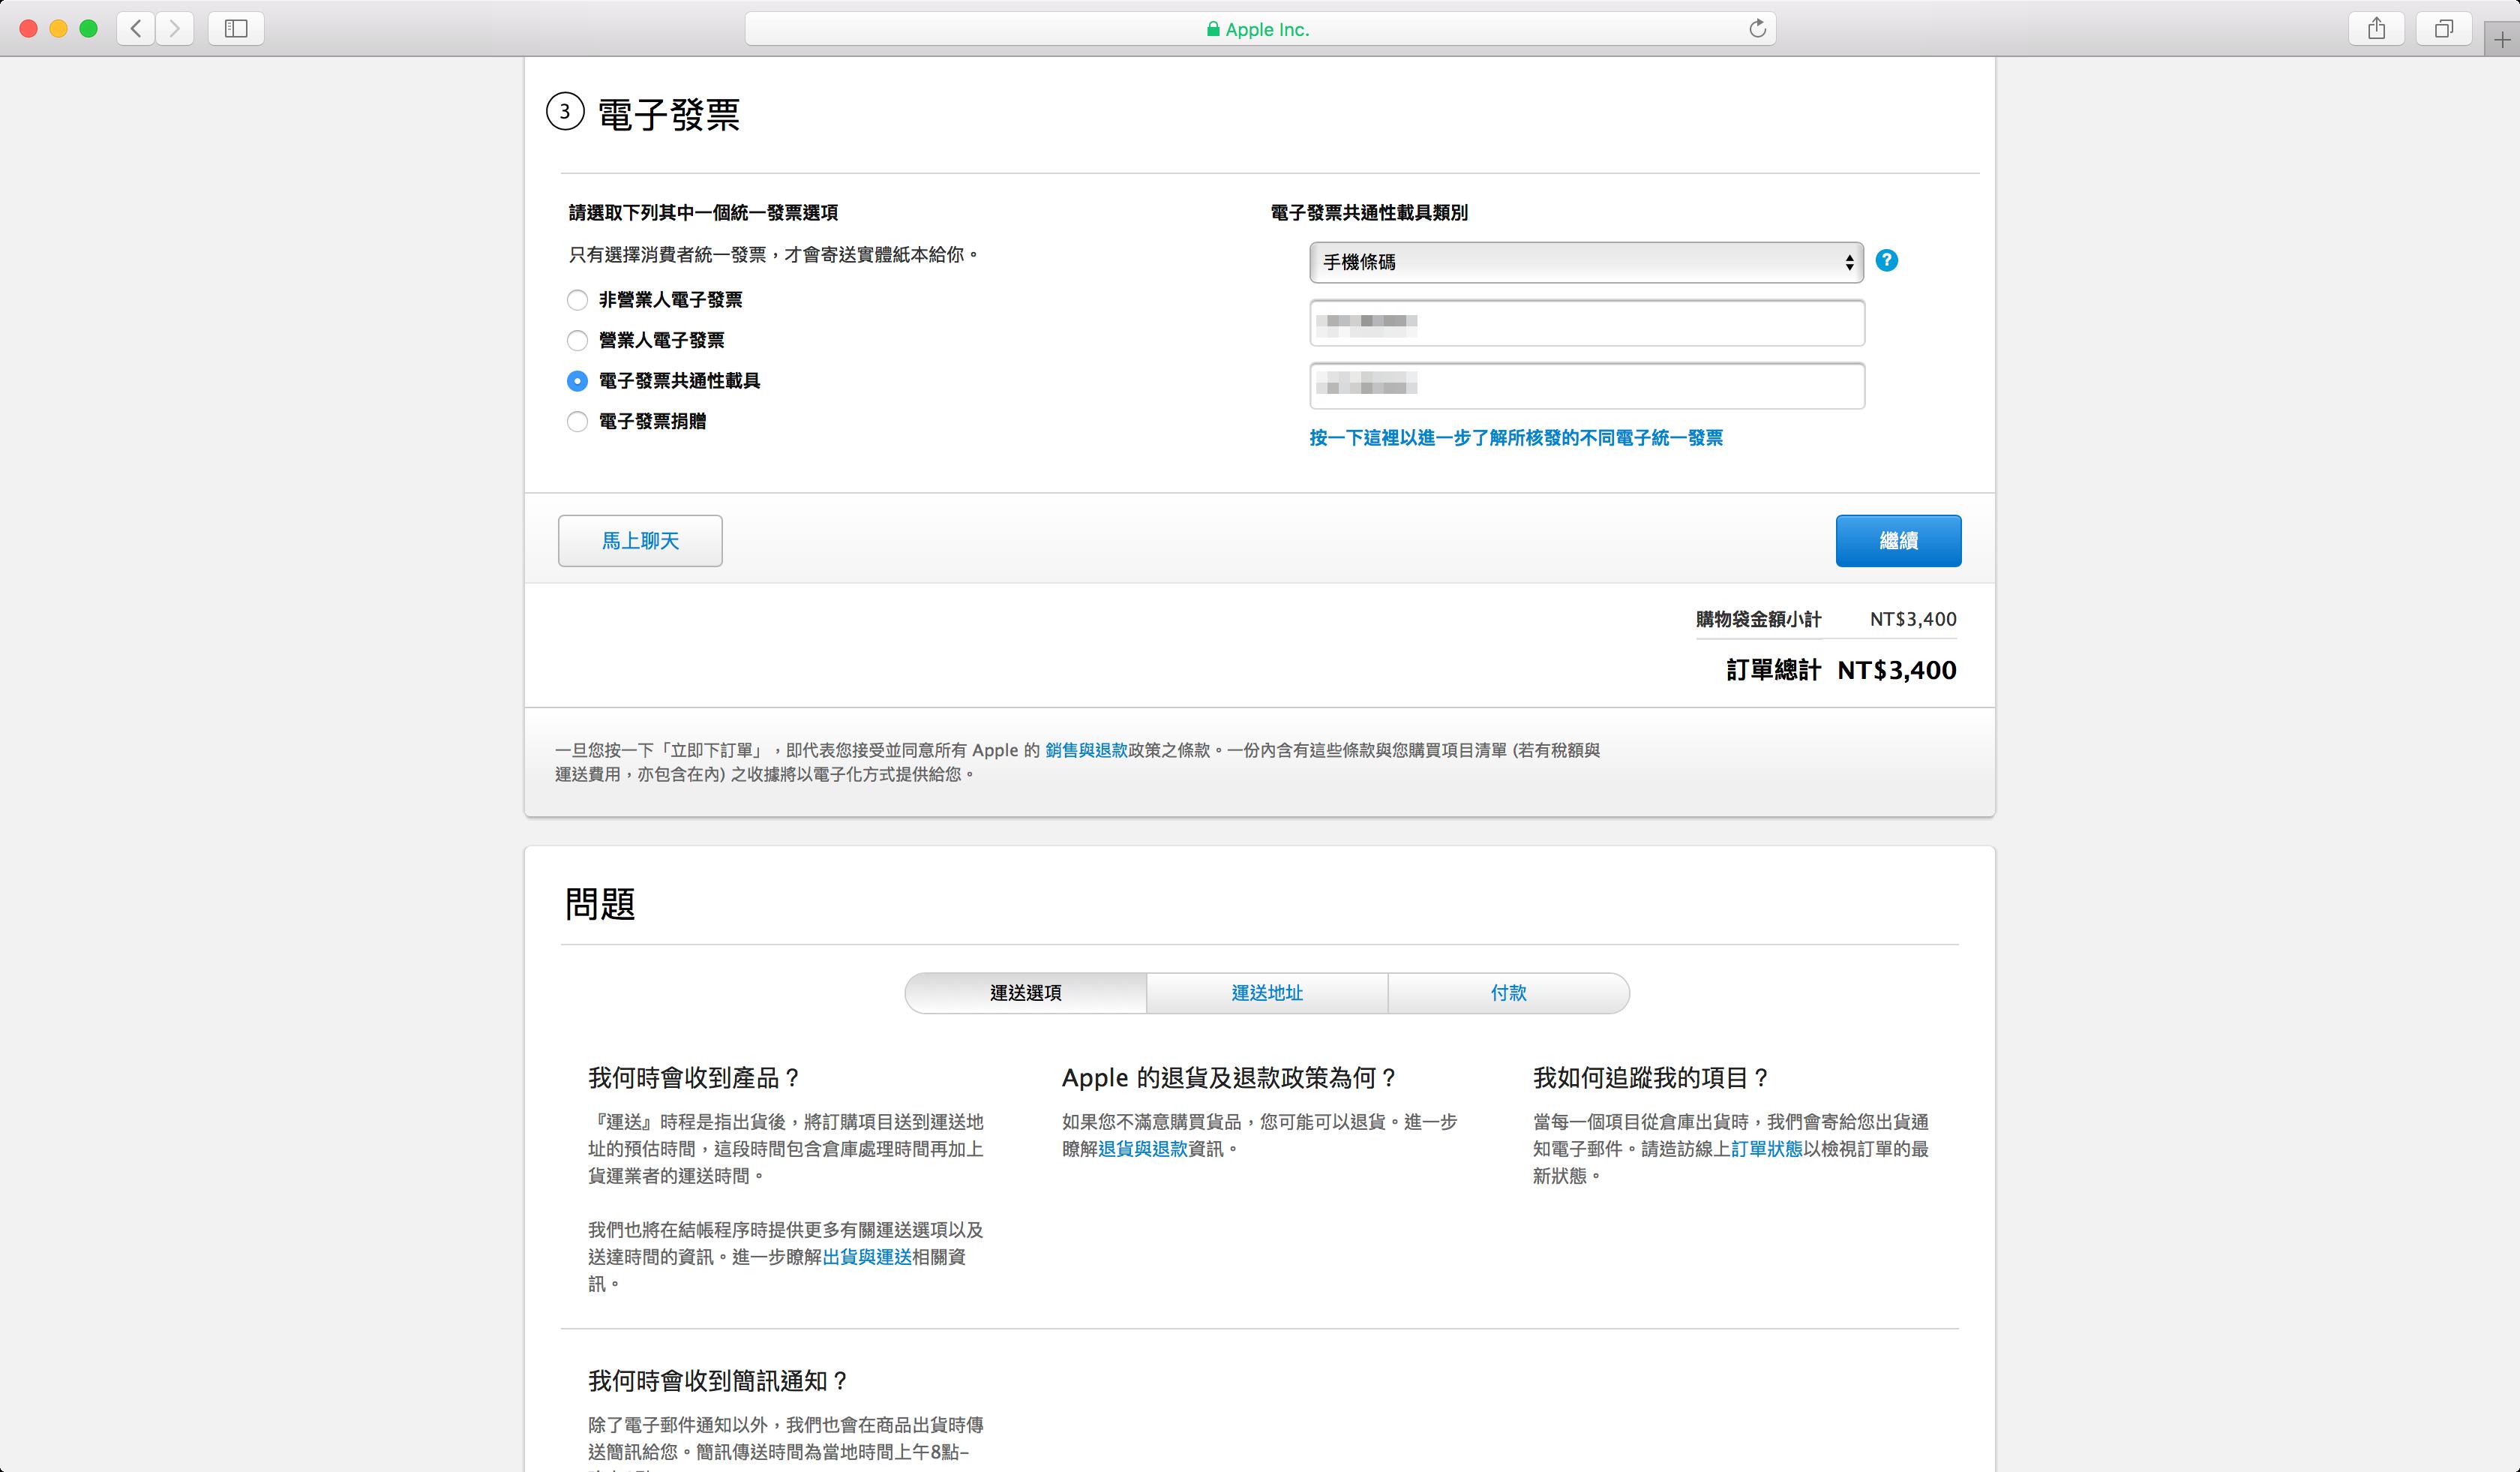 Apple online store - einvoice